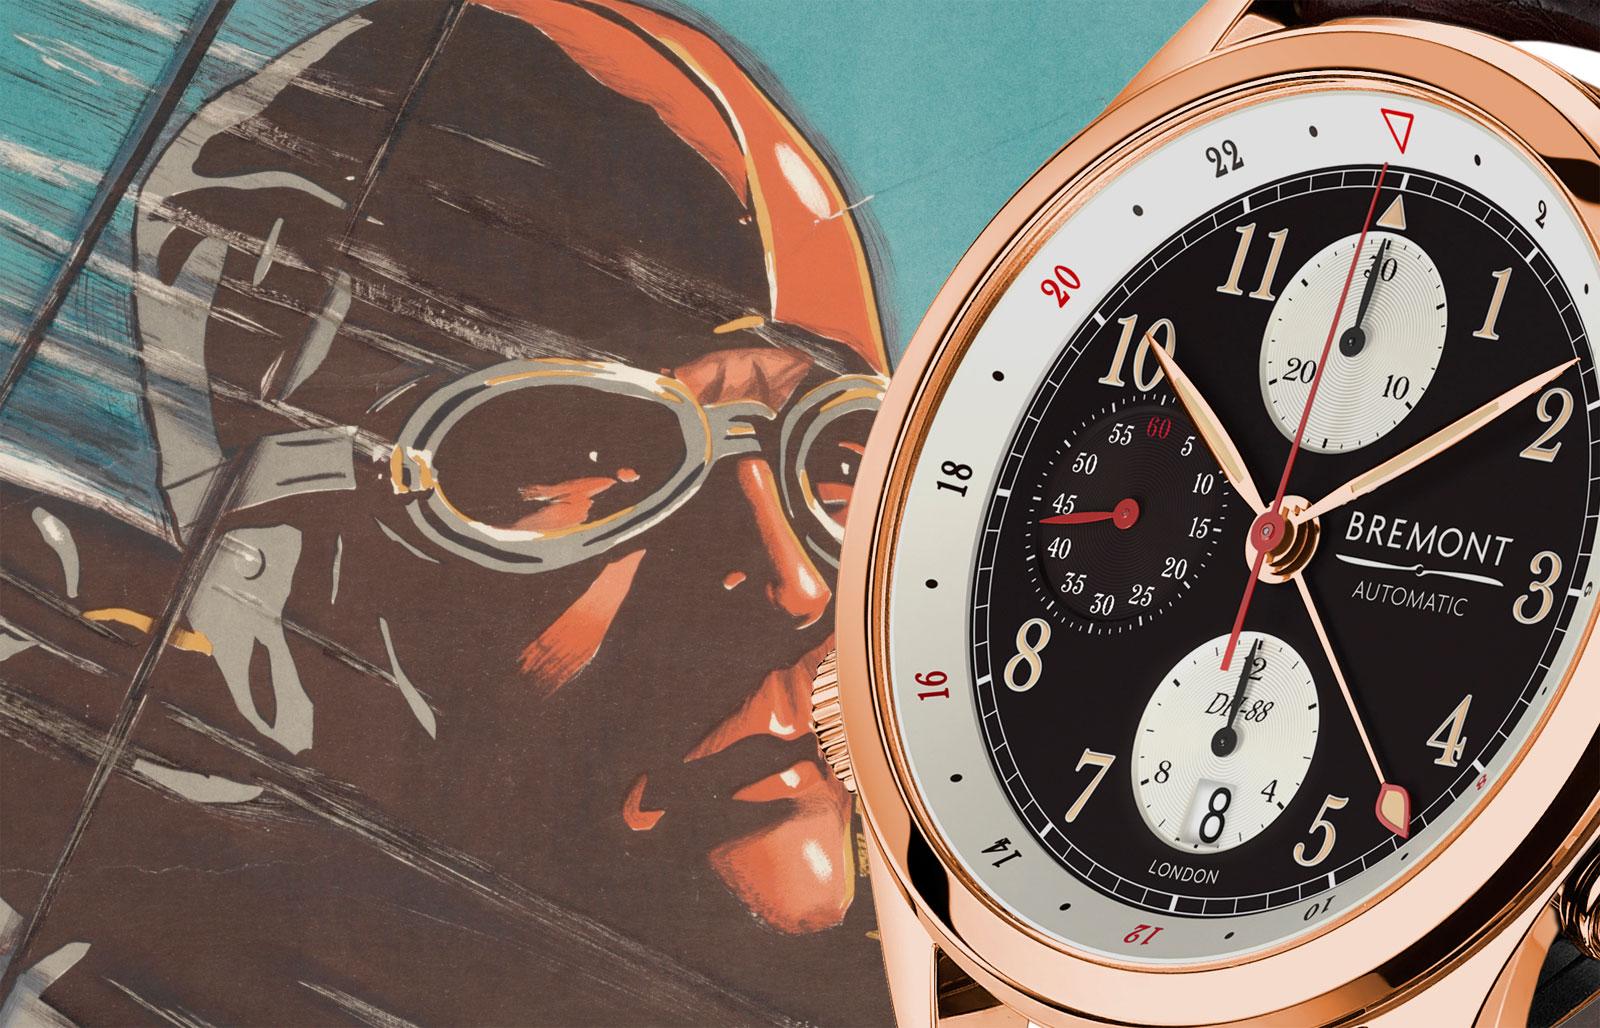 Bremont Celebrates The de Havilland DH-88 Comet With Limited Edition Wristwatch